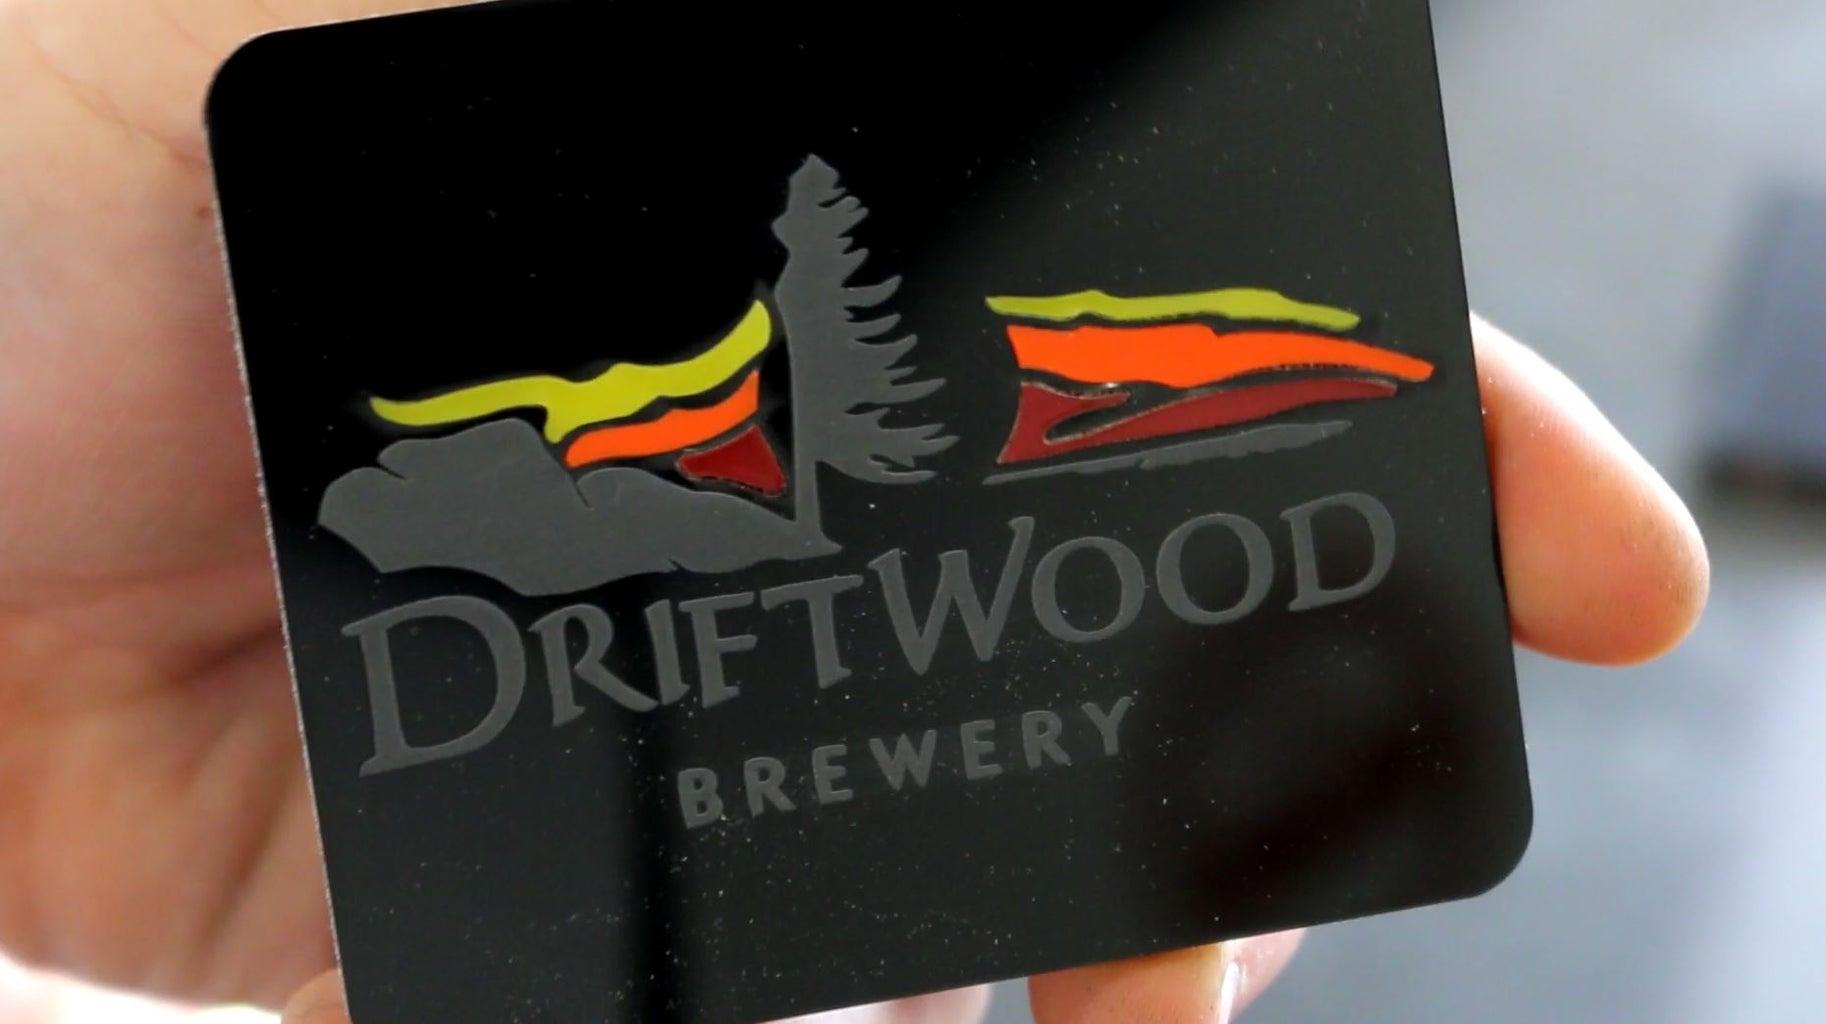 Coaster 4: Driftwood Brewery